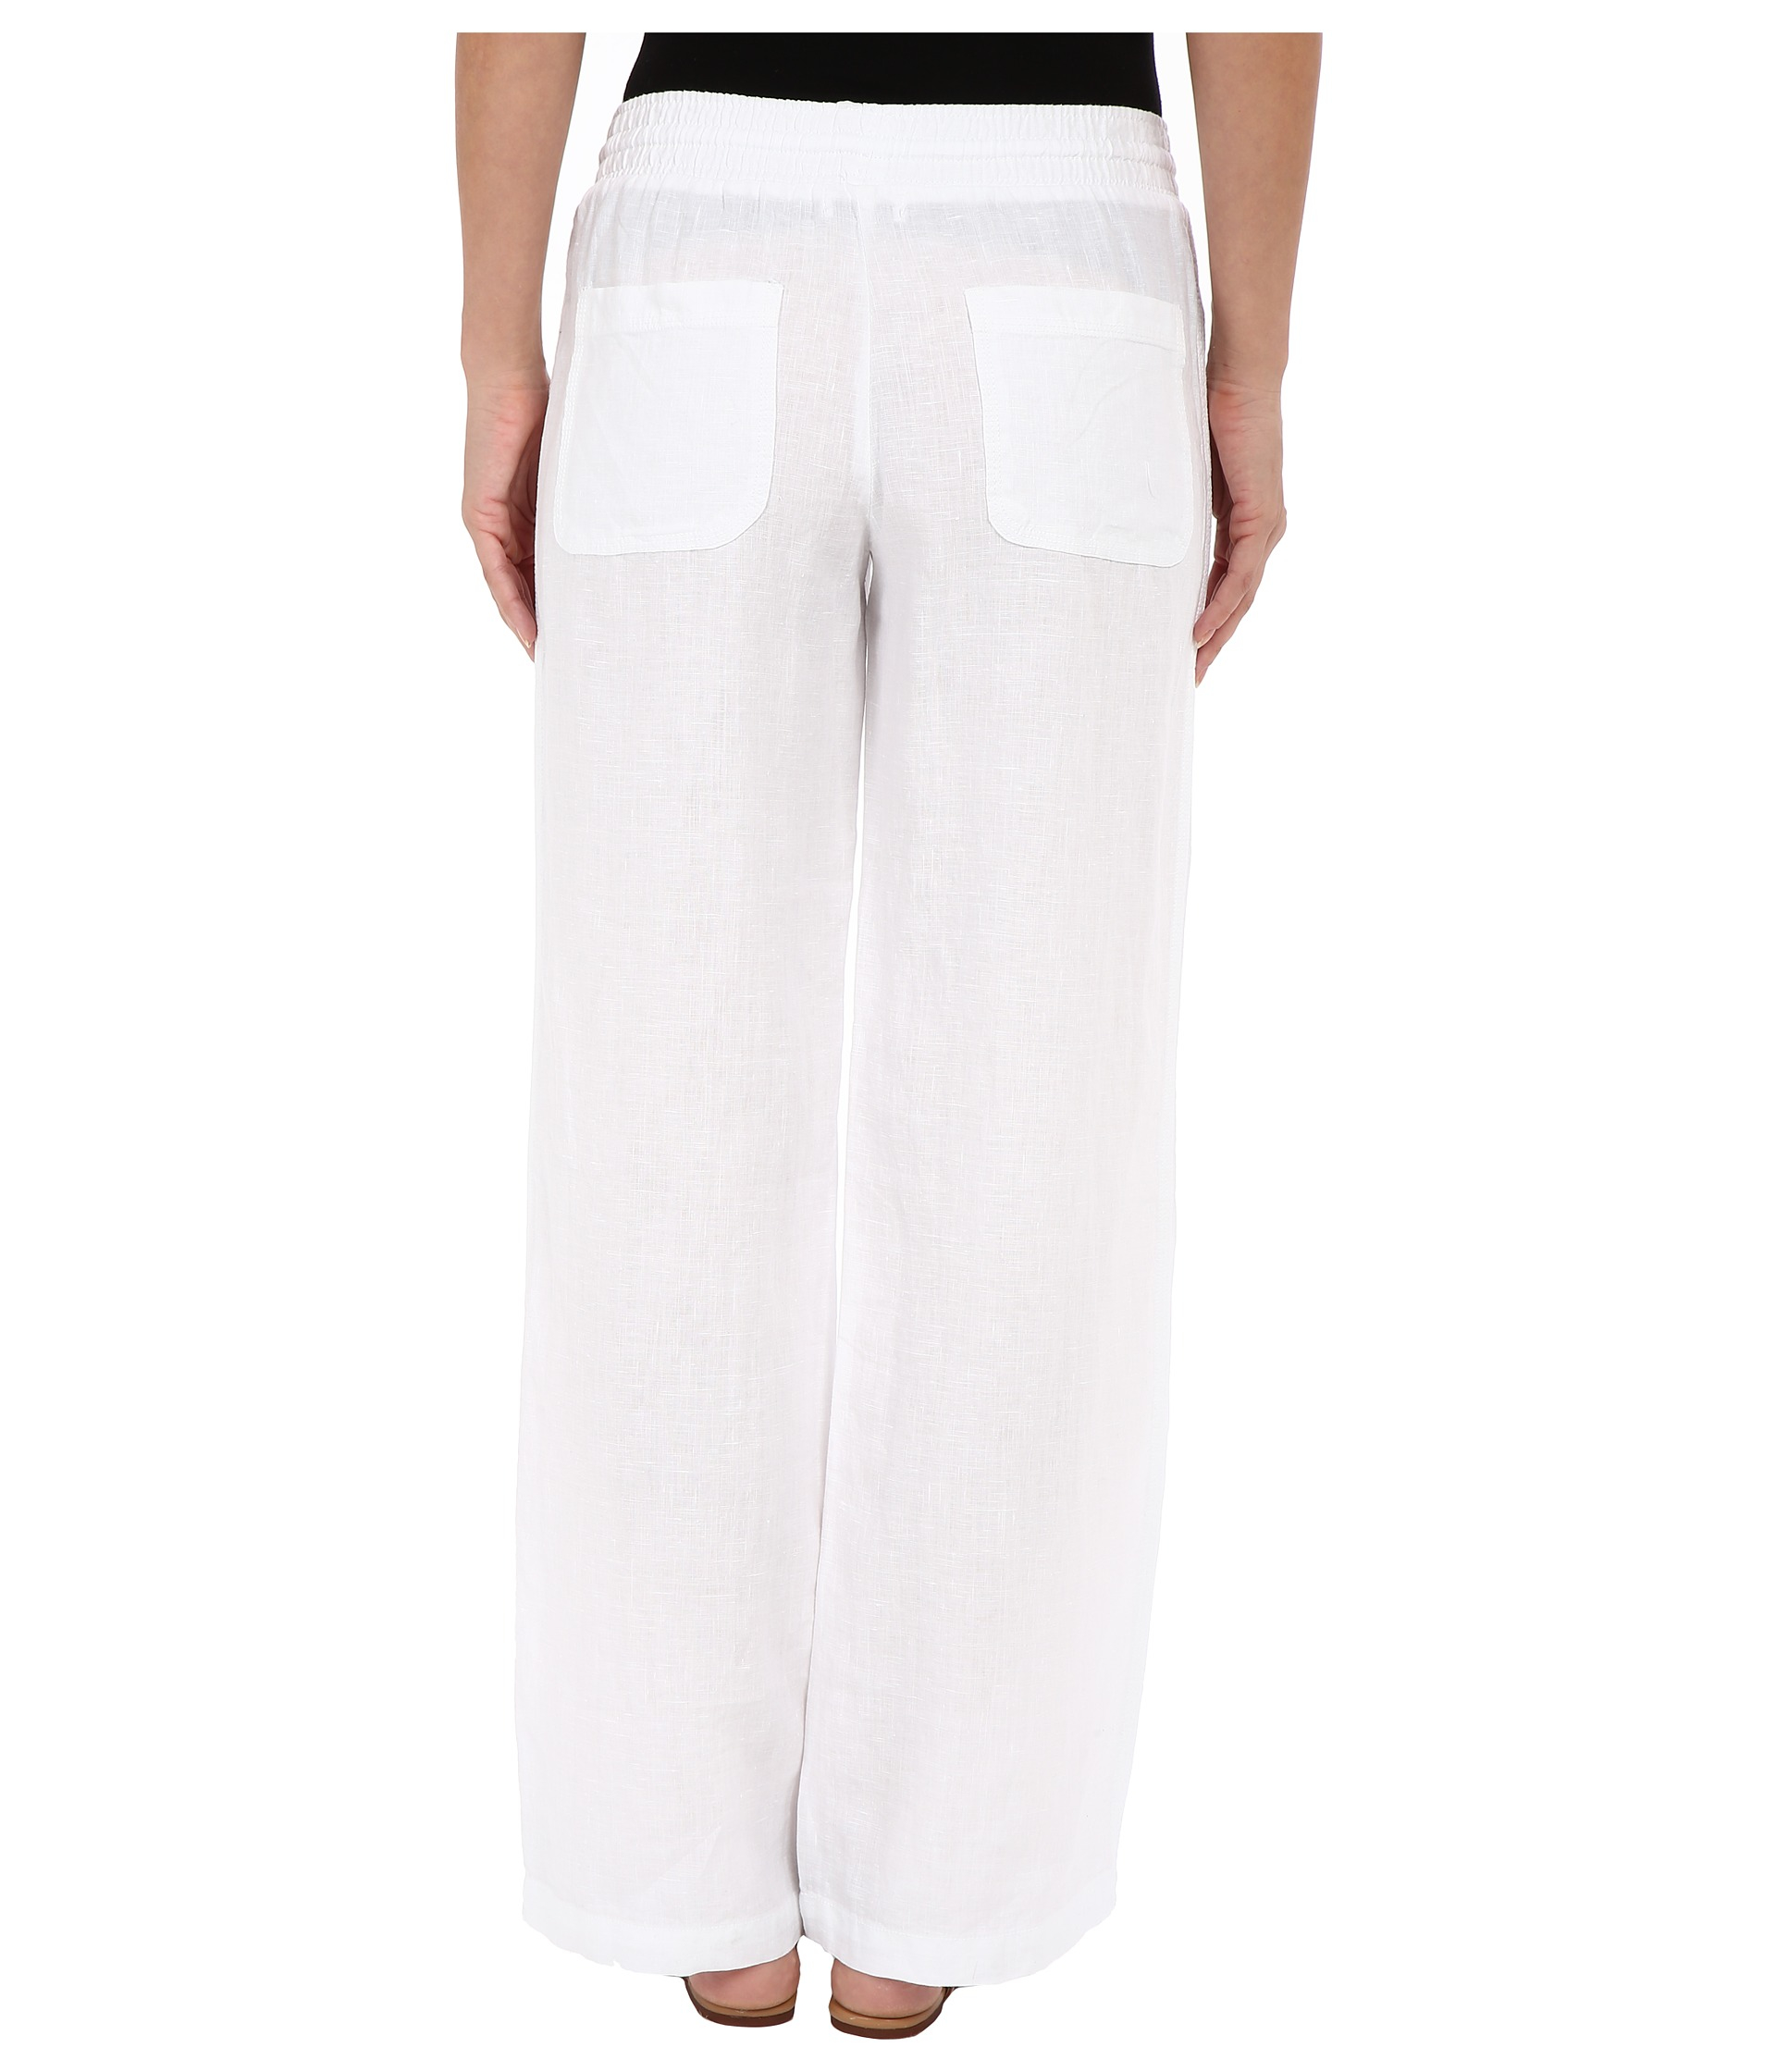 Cool INC 3404 Womens Beige Linen Jogger Curvy Fit Cargo Pants 12 BHFO